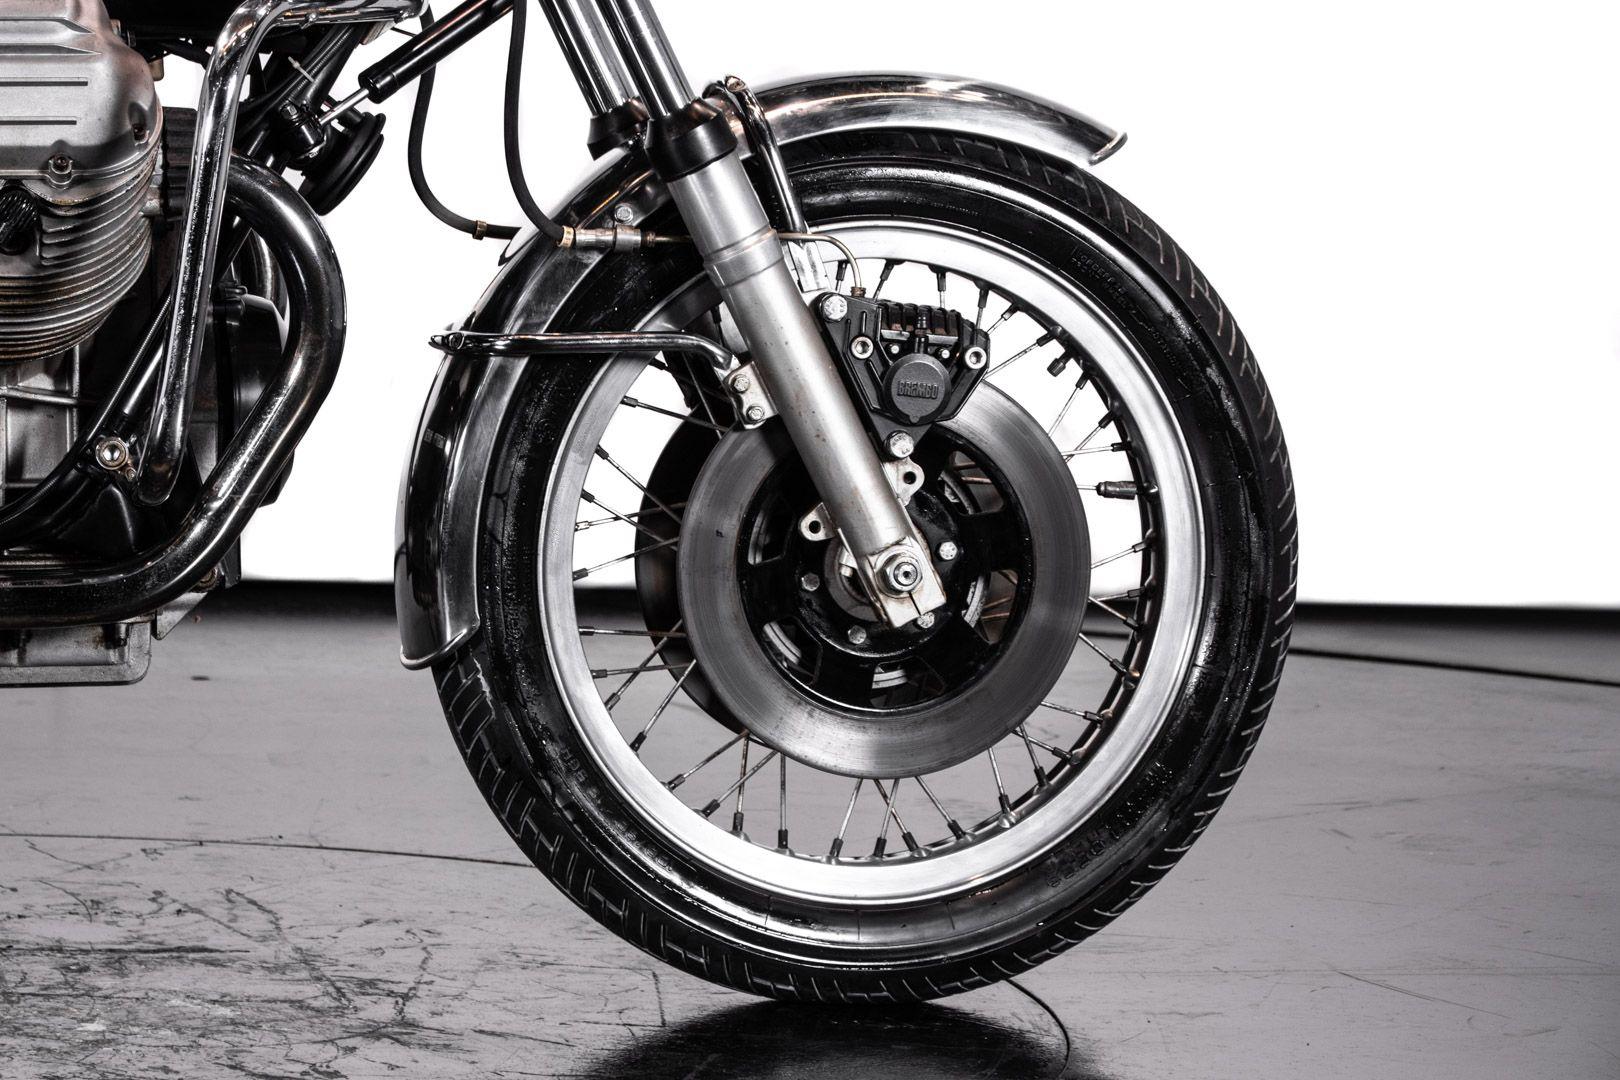 1981 Moto Guzzi 850 T3 California 83255